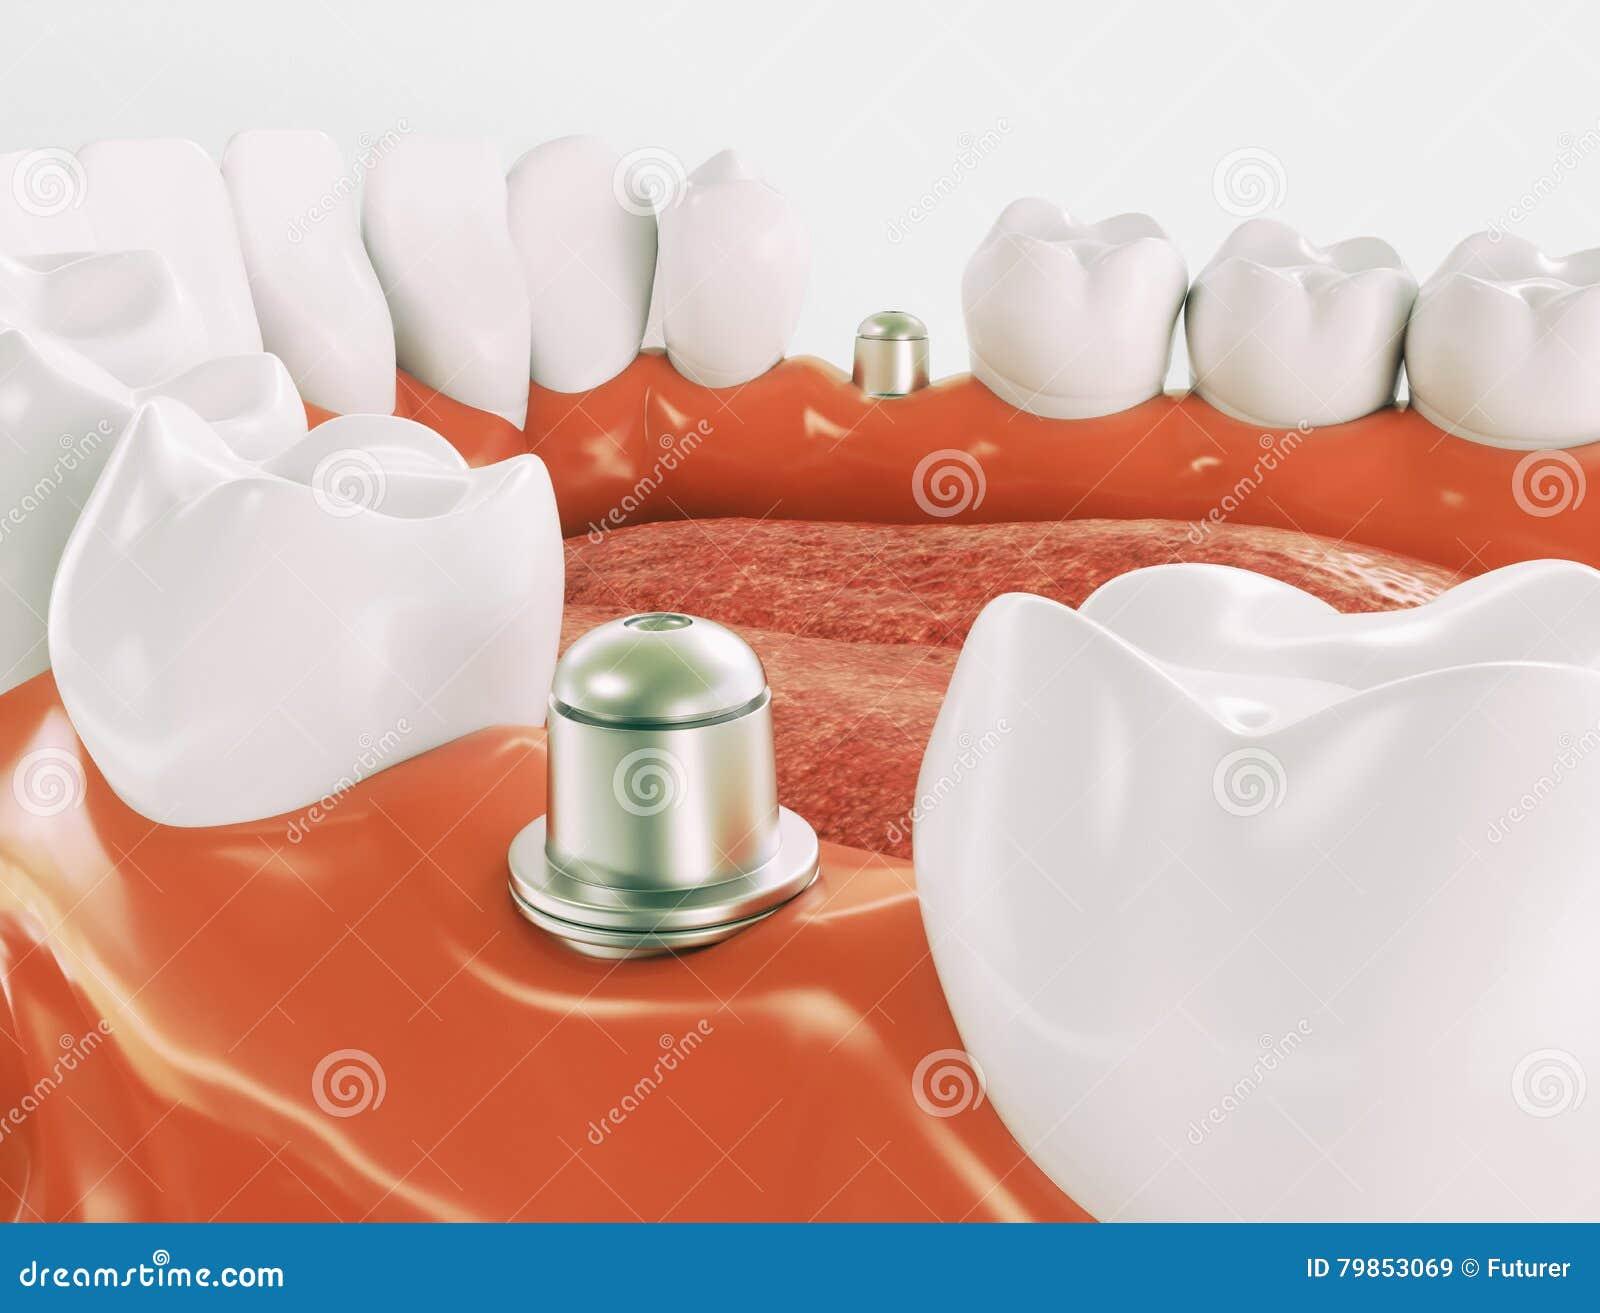 Stomatologiczny wszczep 3d rendering - serie 1 3 -